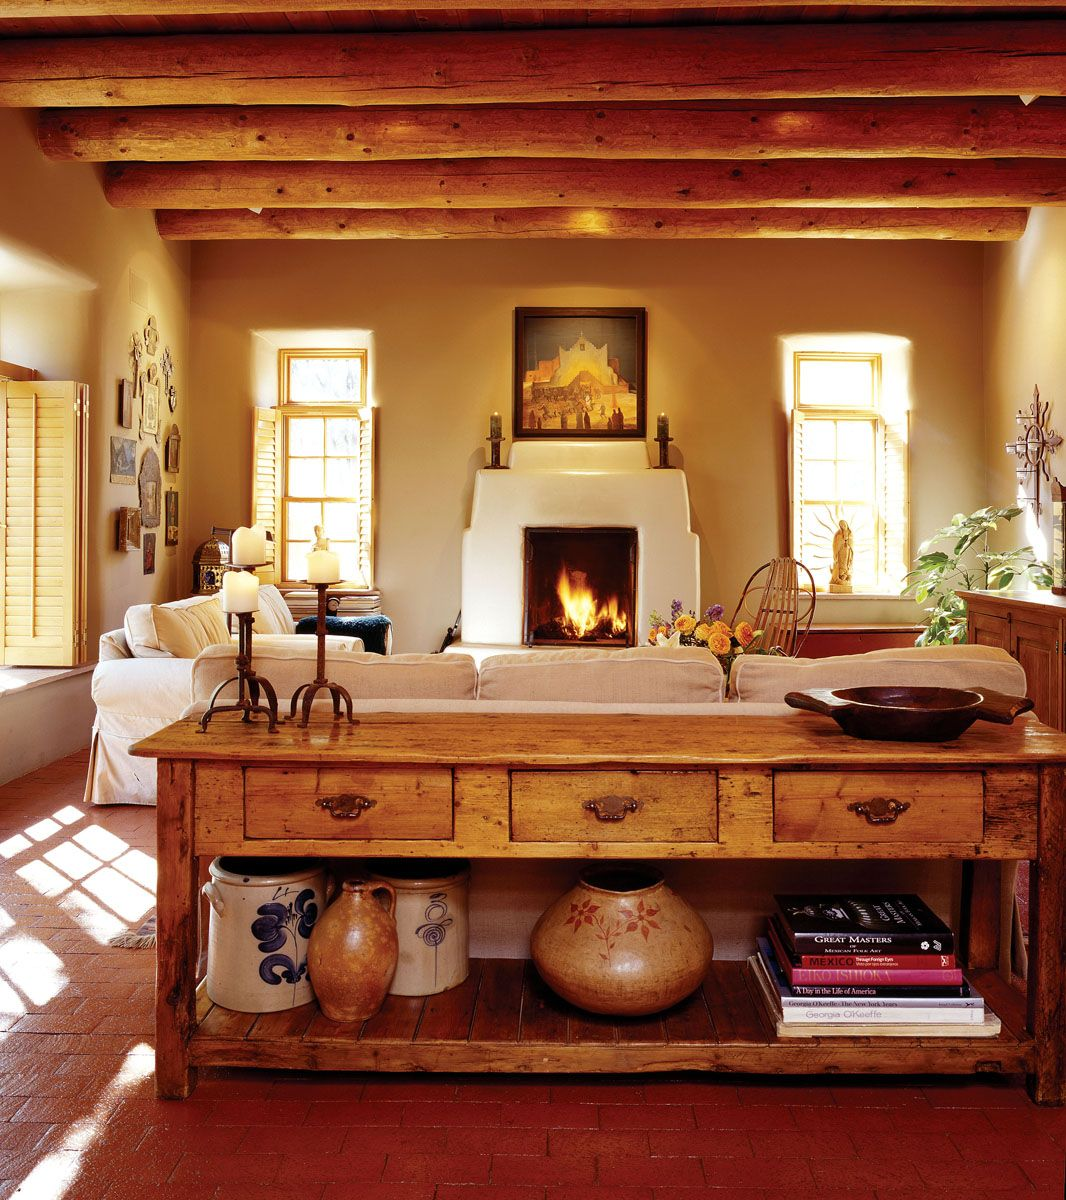 Behind Adobe Walls Southwestern Home Decor Southwestern Home